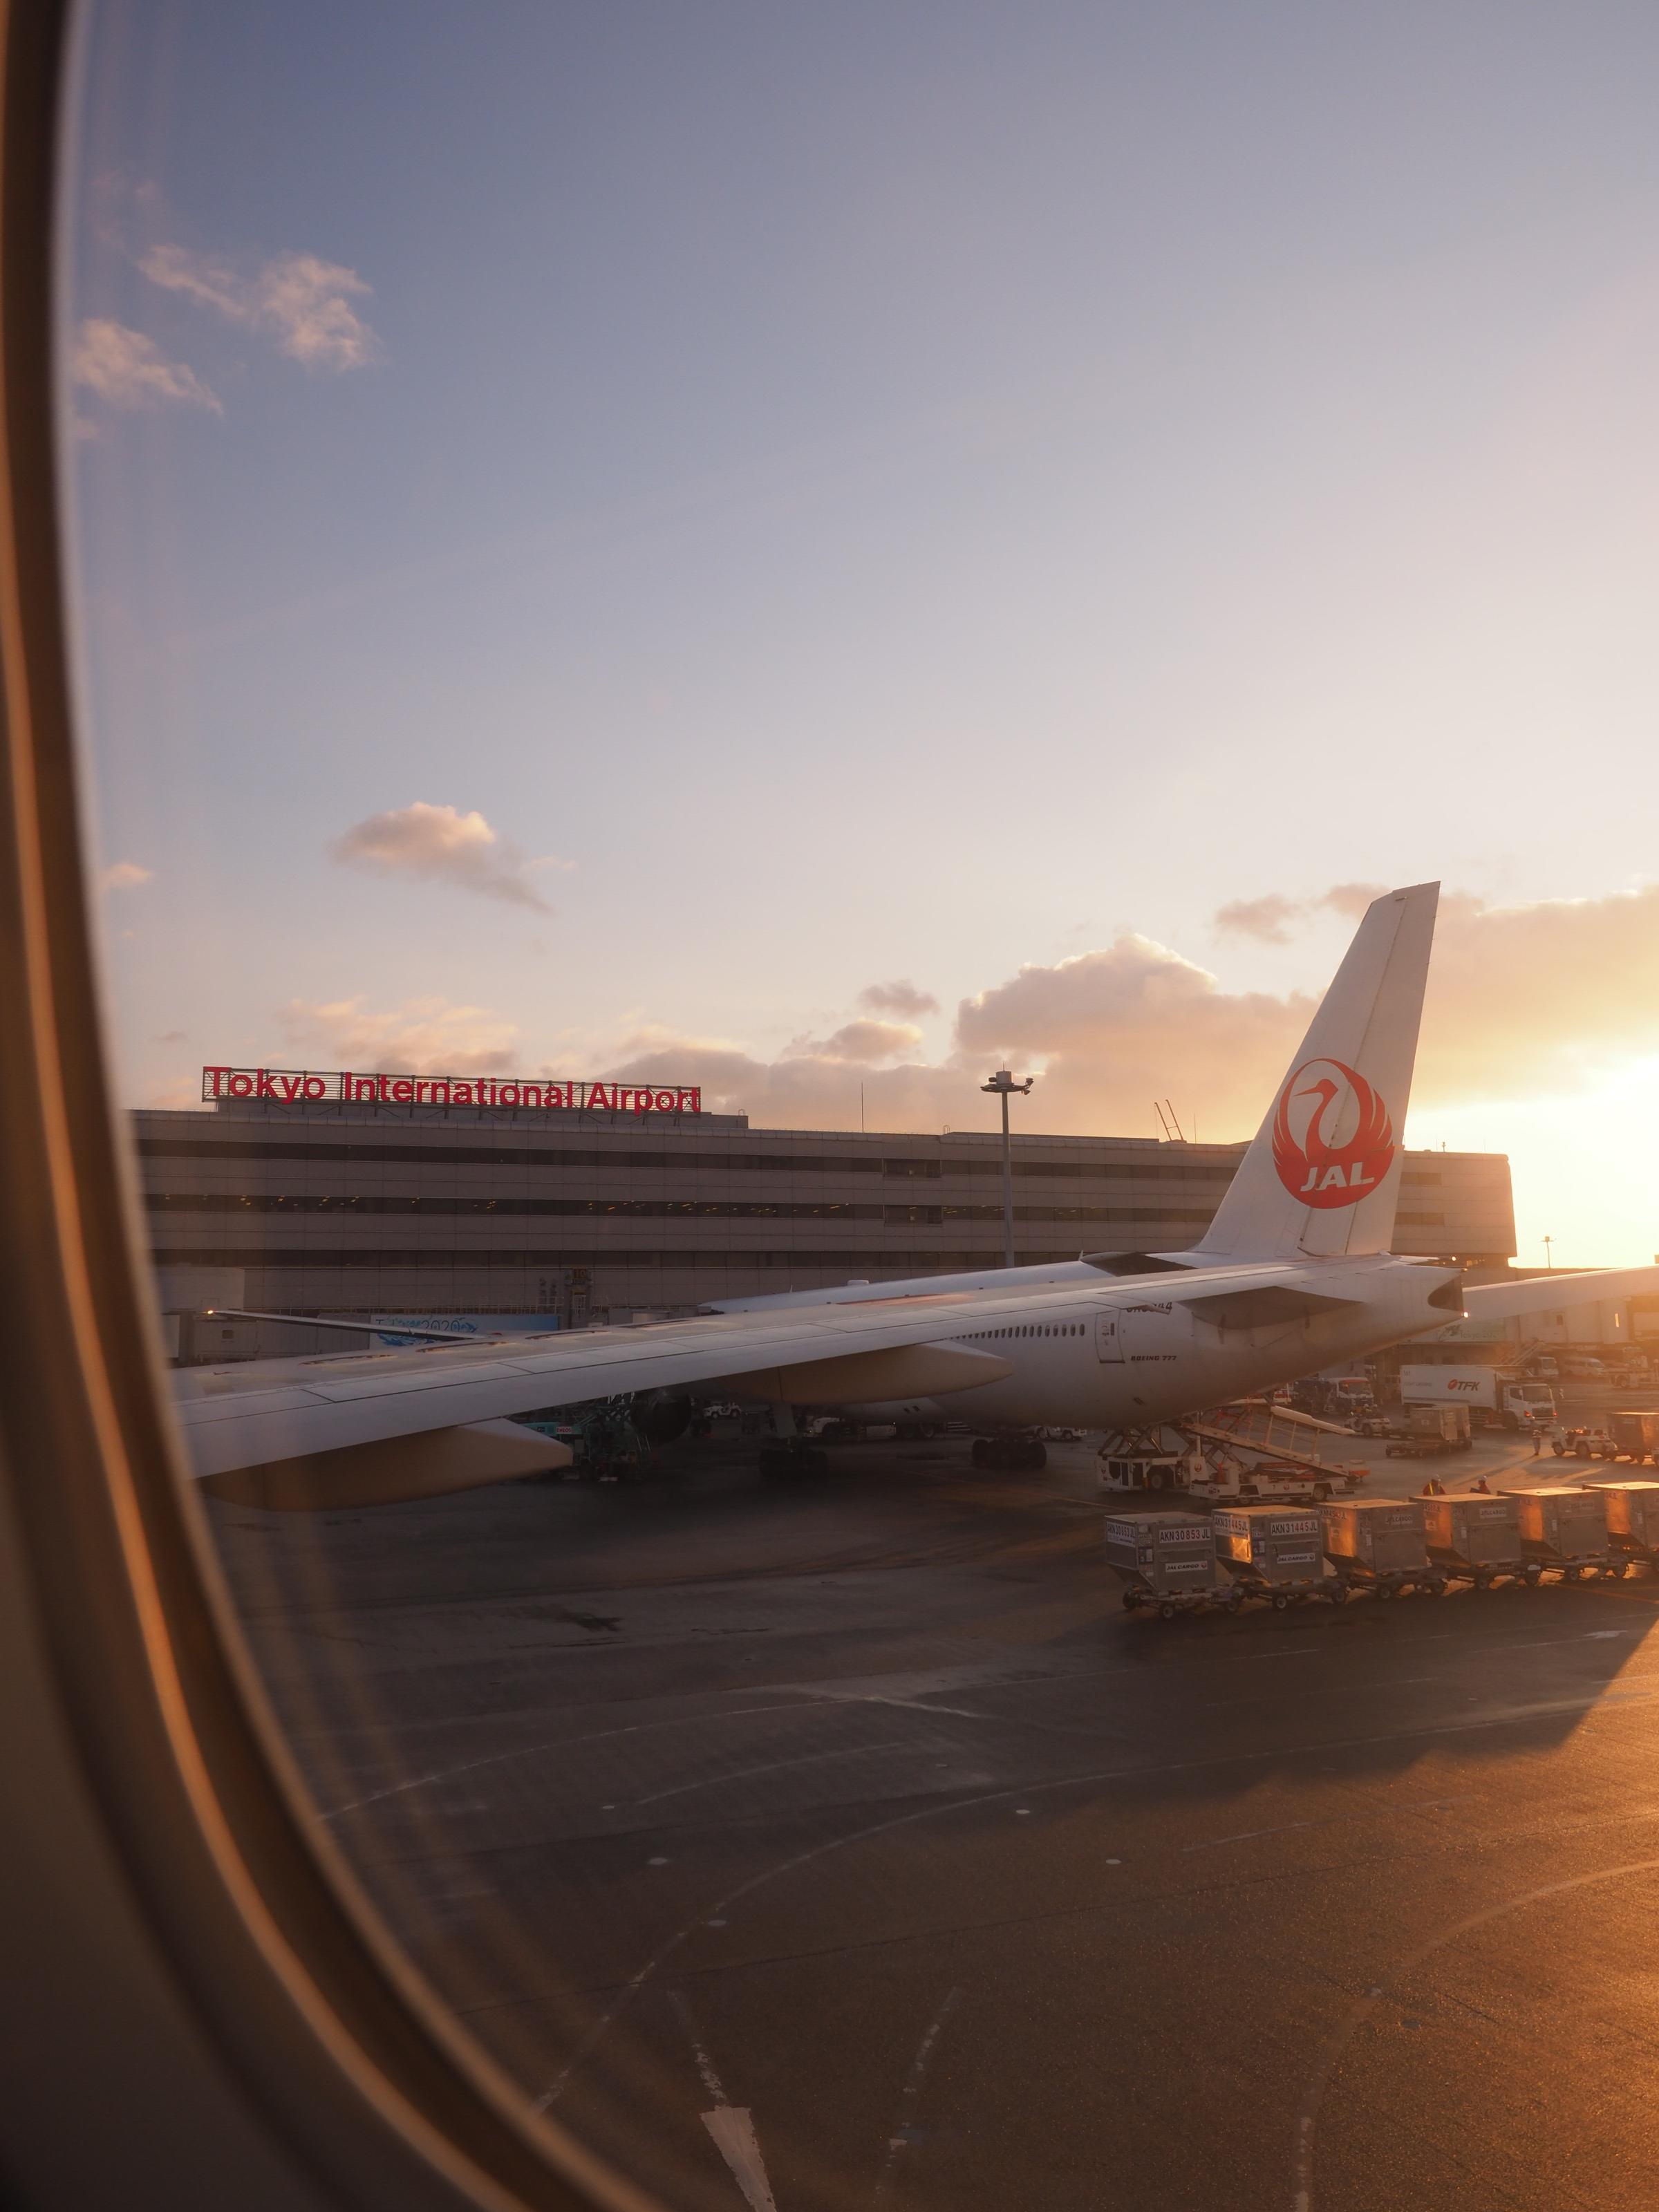 Japan Airlines Tokyo